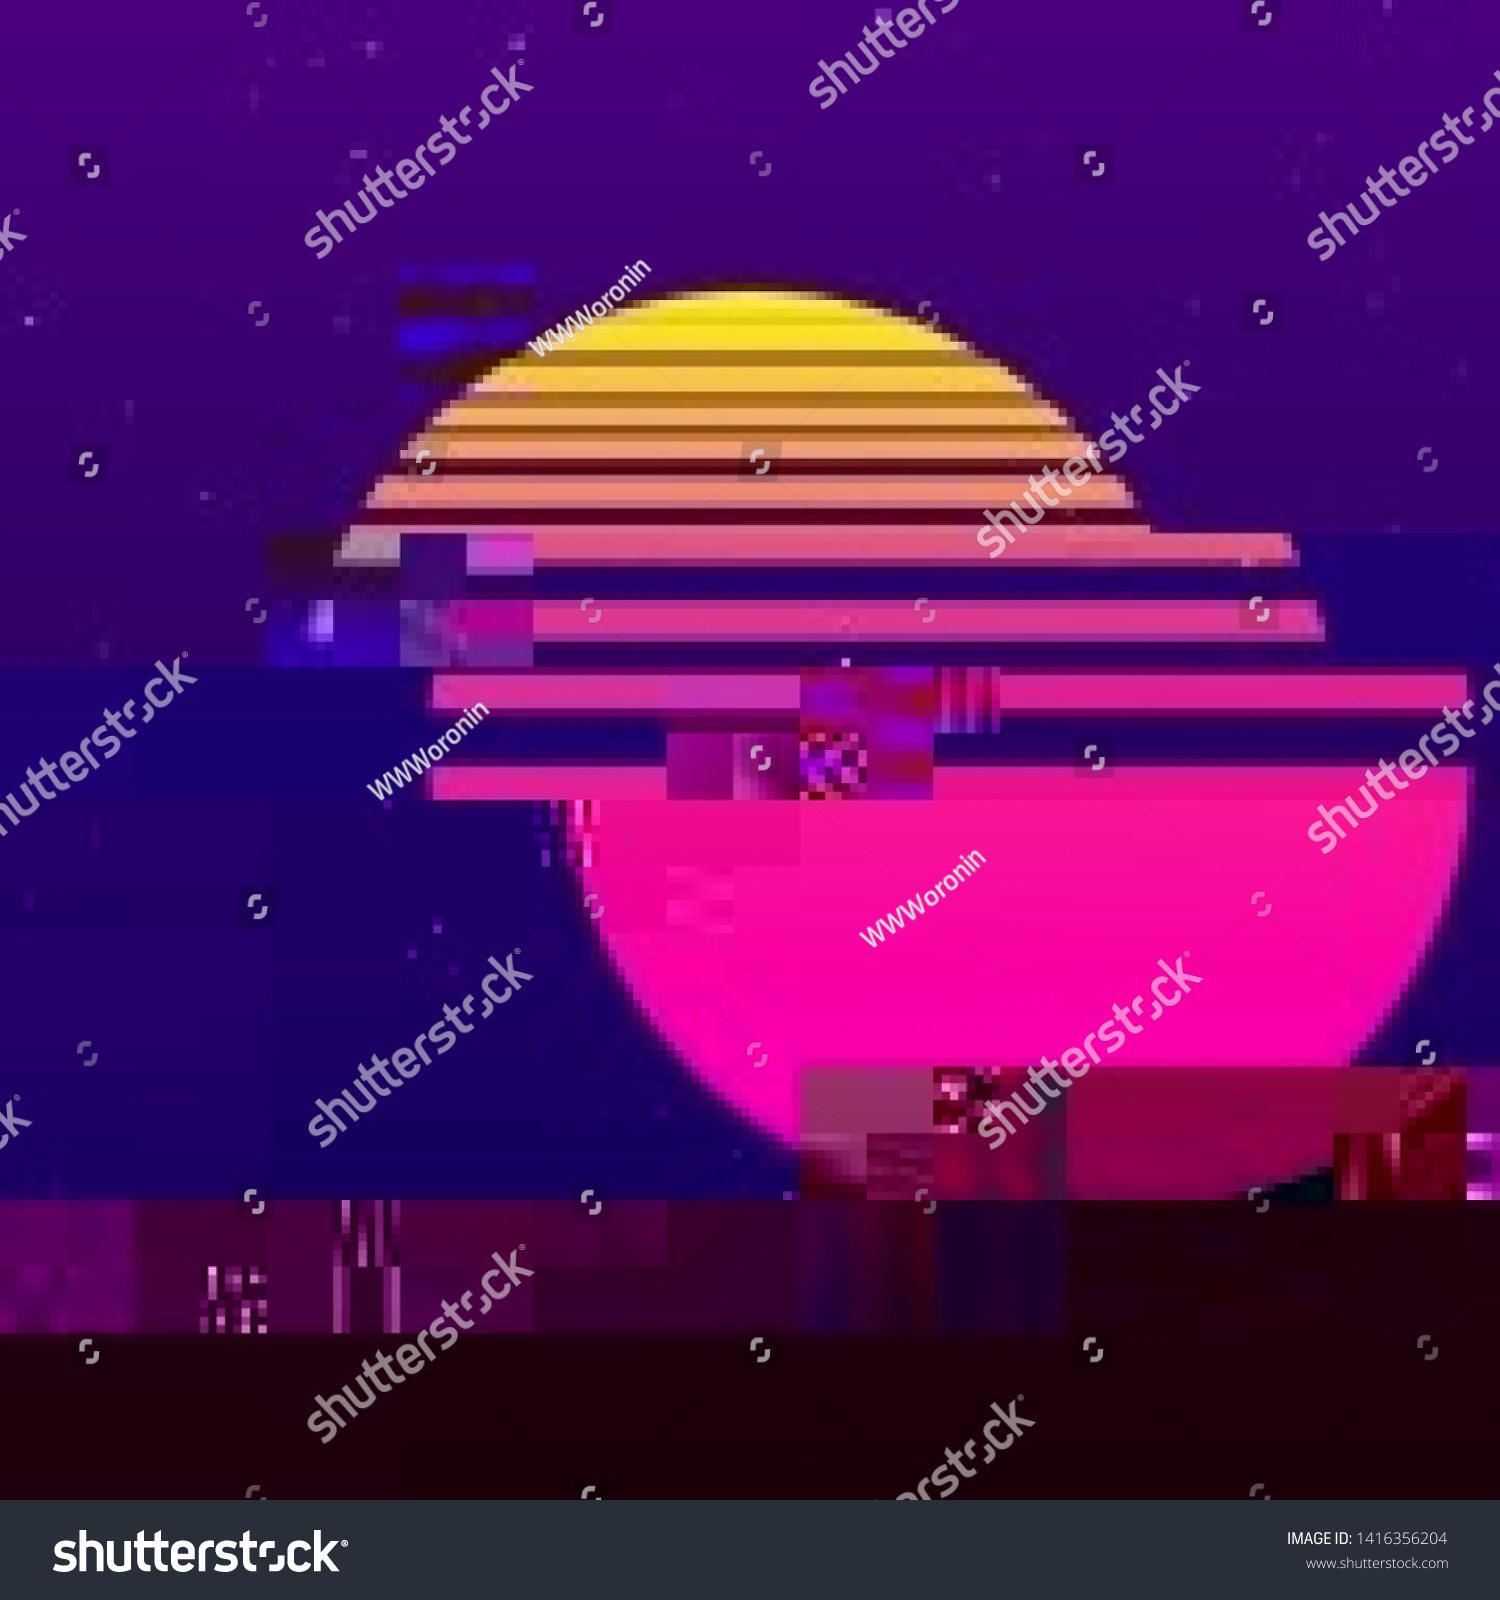 Abstract Cyberpunk Background Striped Alien Sun Stock Image